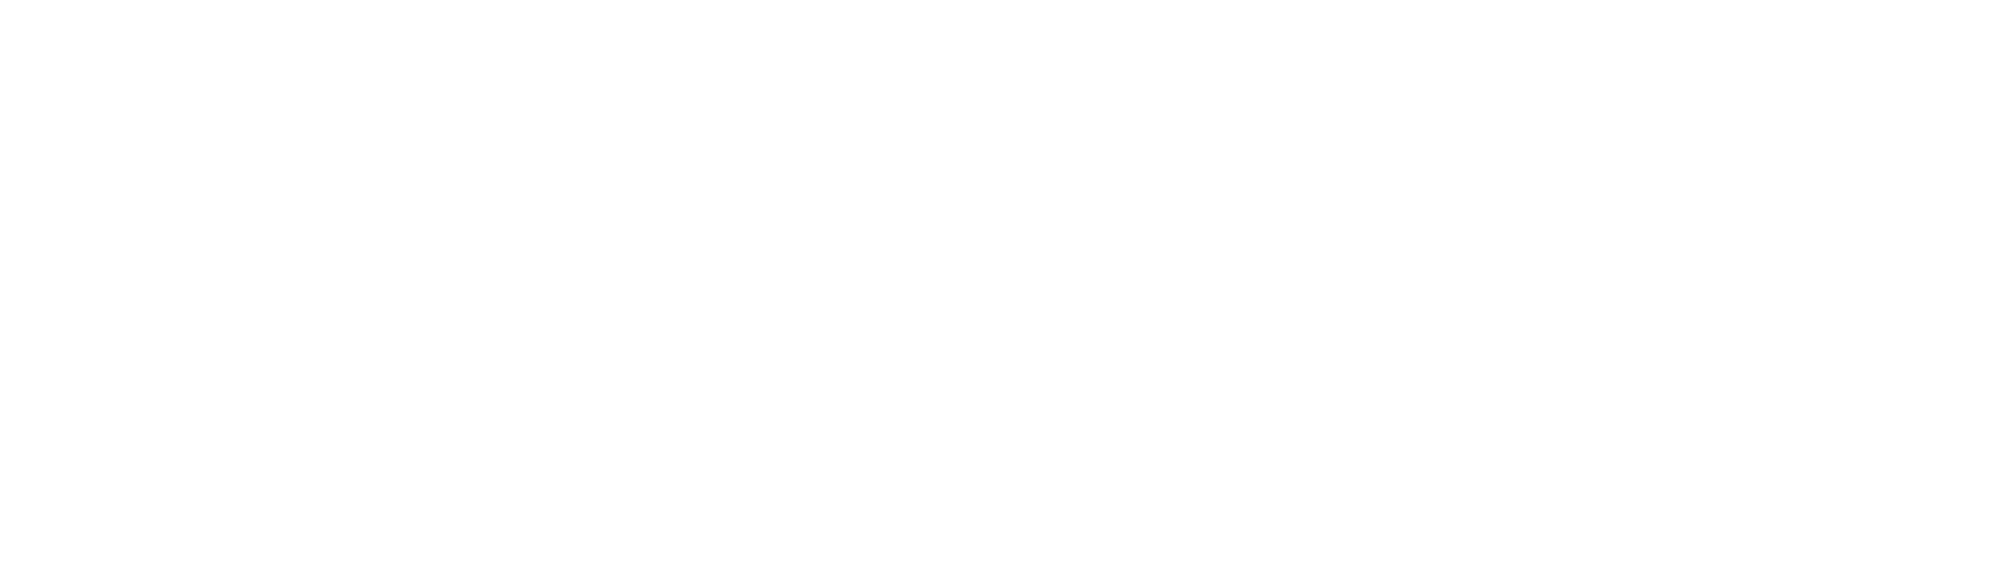 Driftopia.com